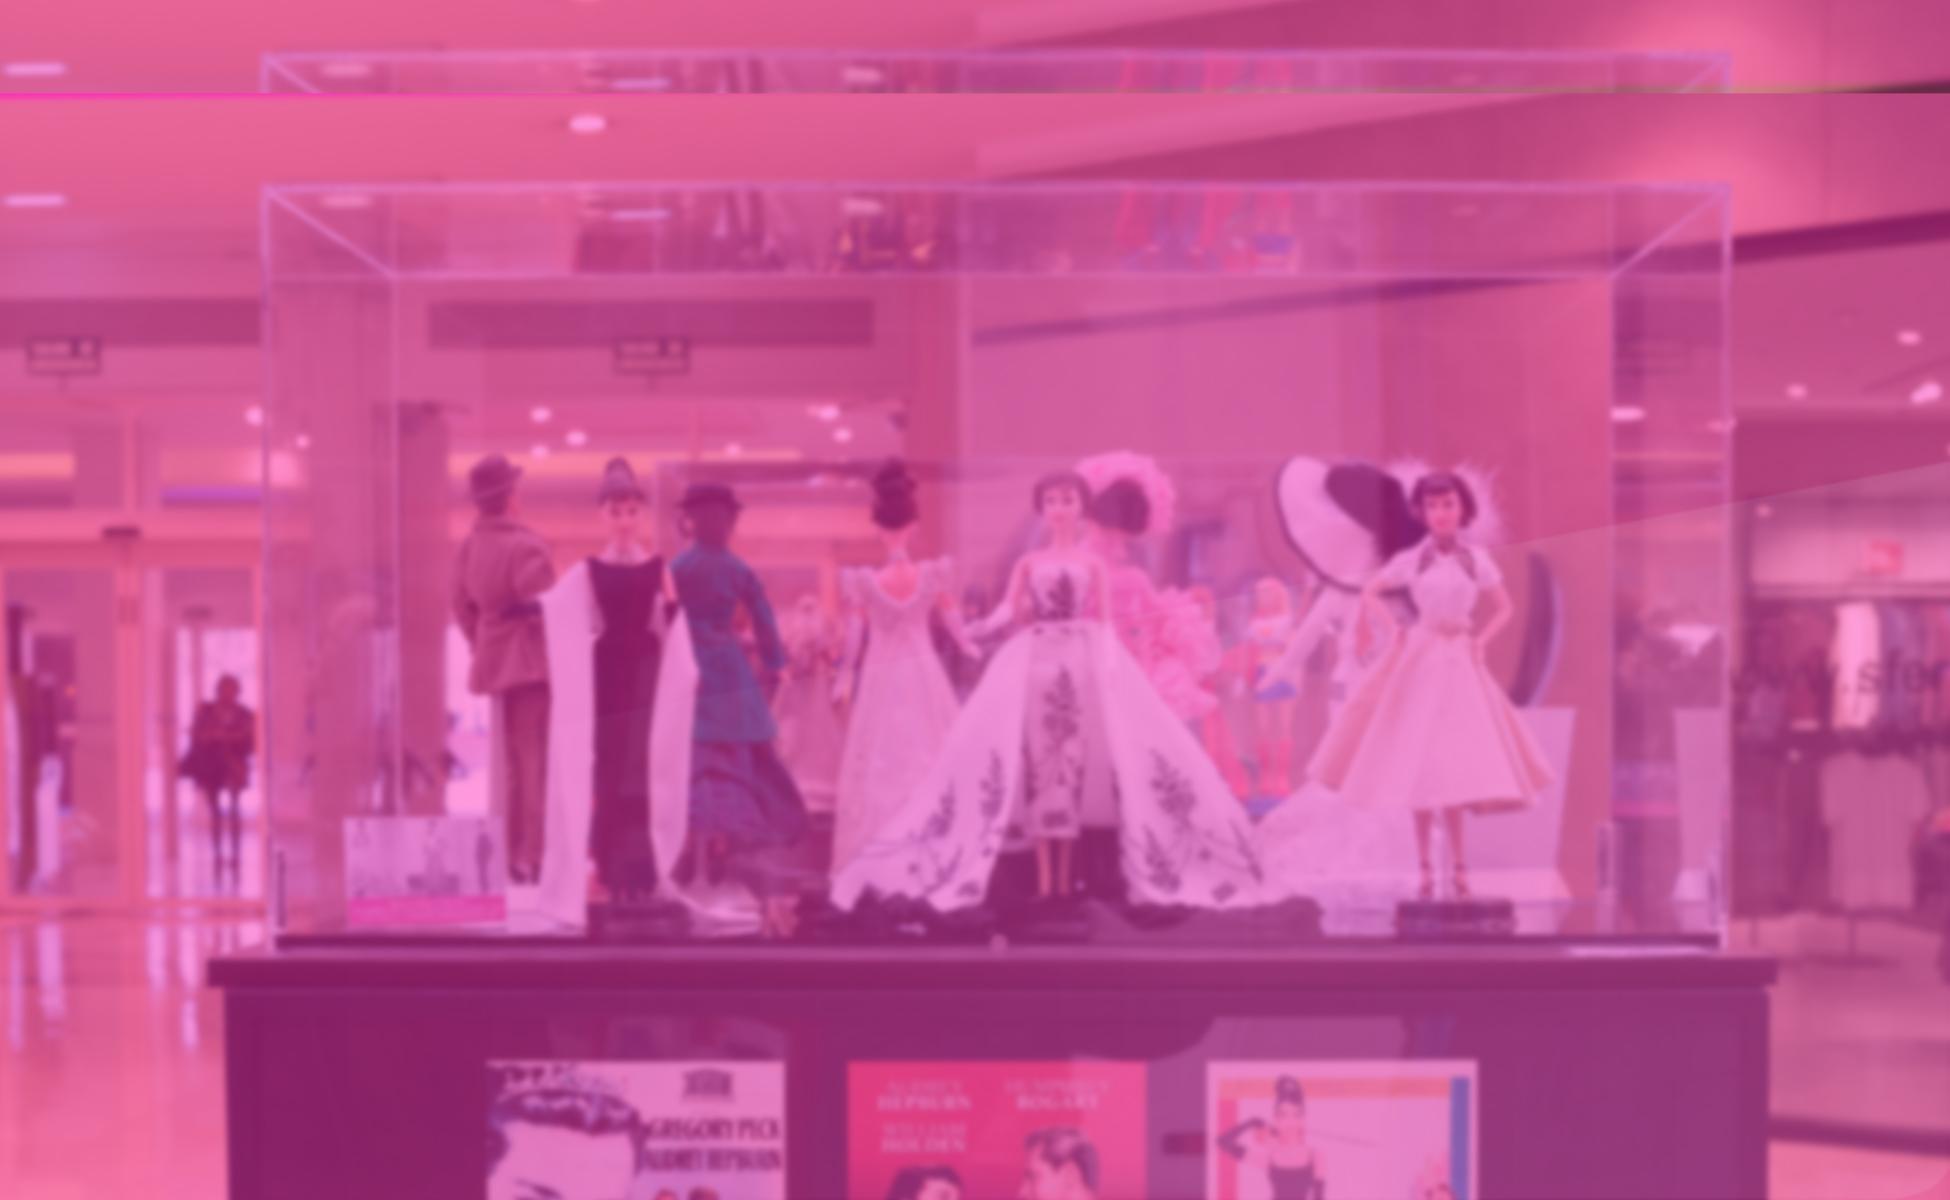 expositor barbie plaza loranca 2